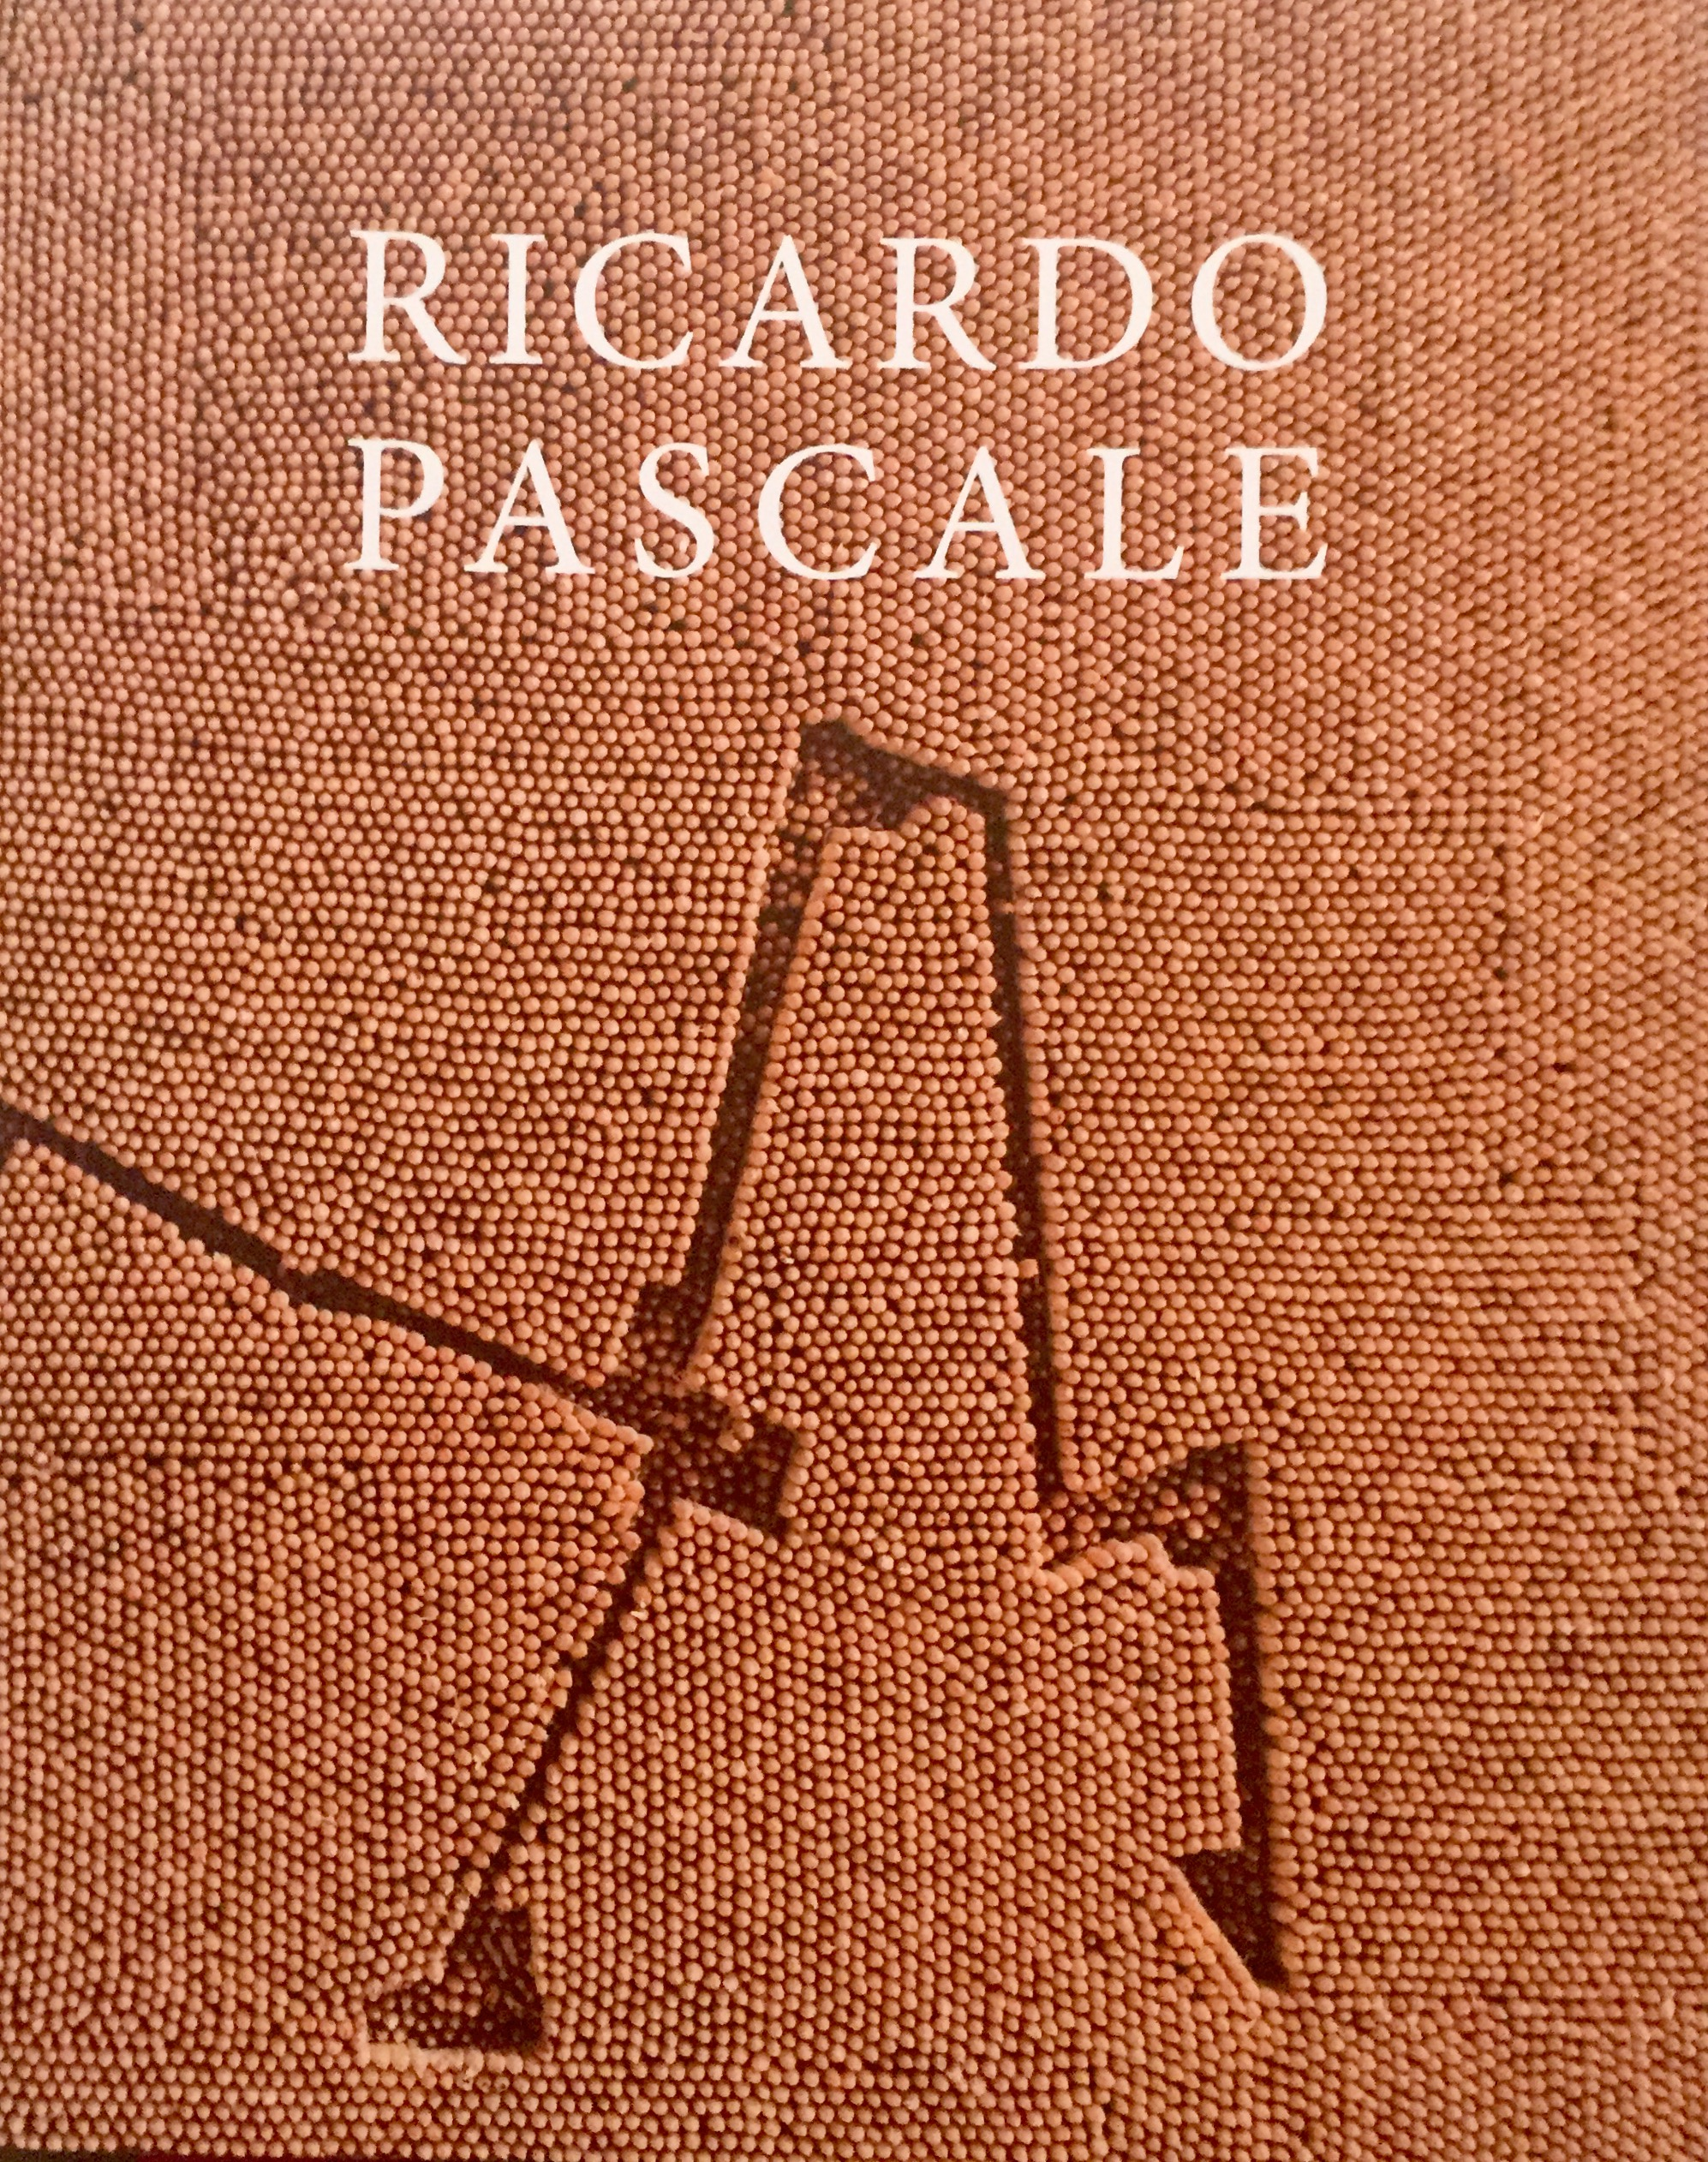 Ricardo Pascale